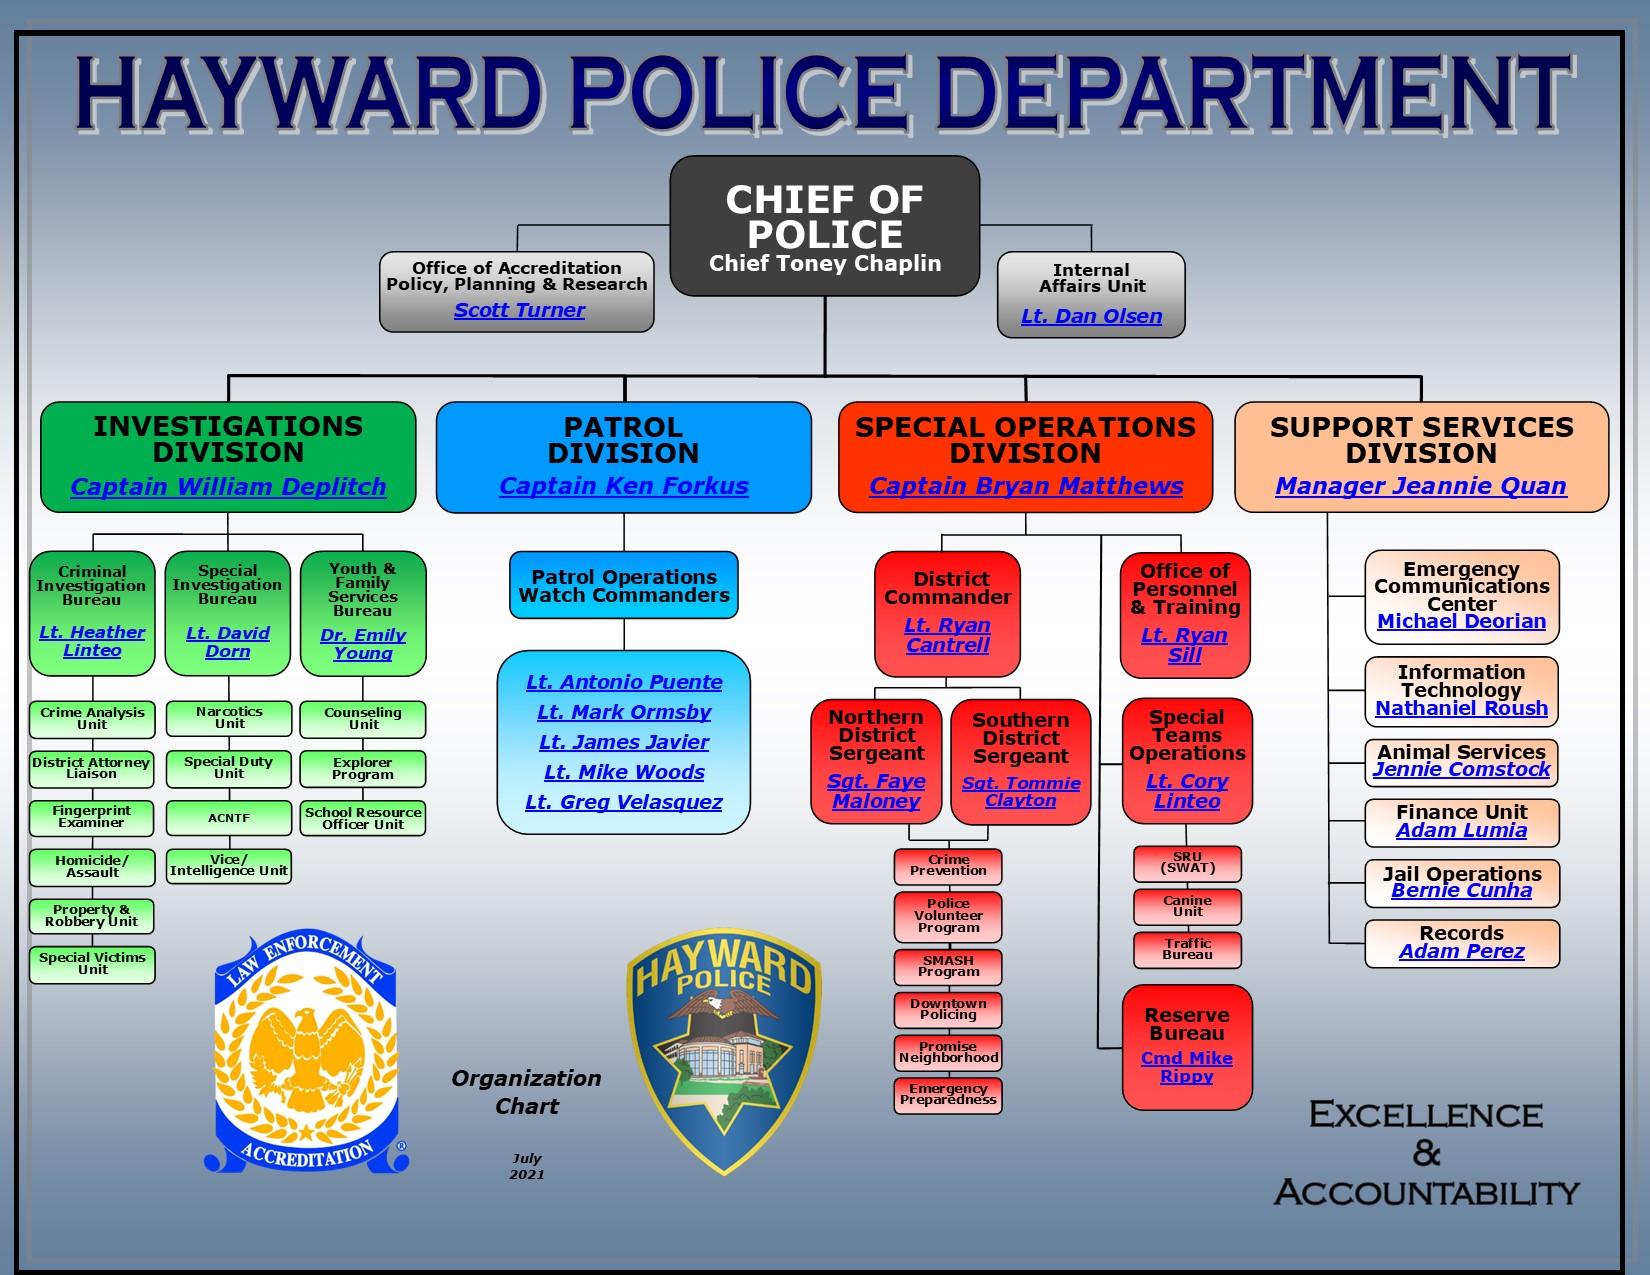 Hayward Police Department Organizational Chart